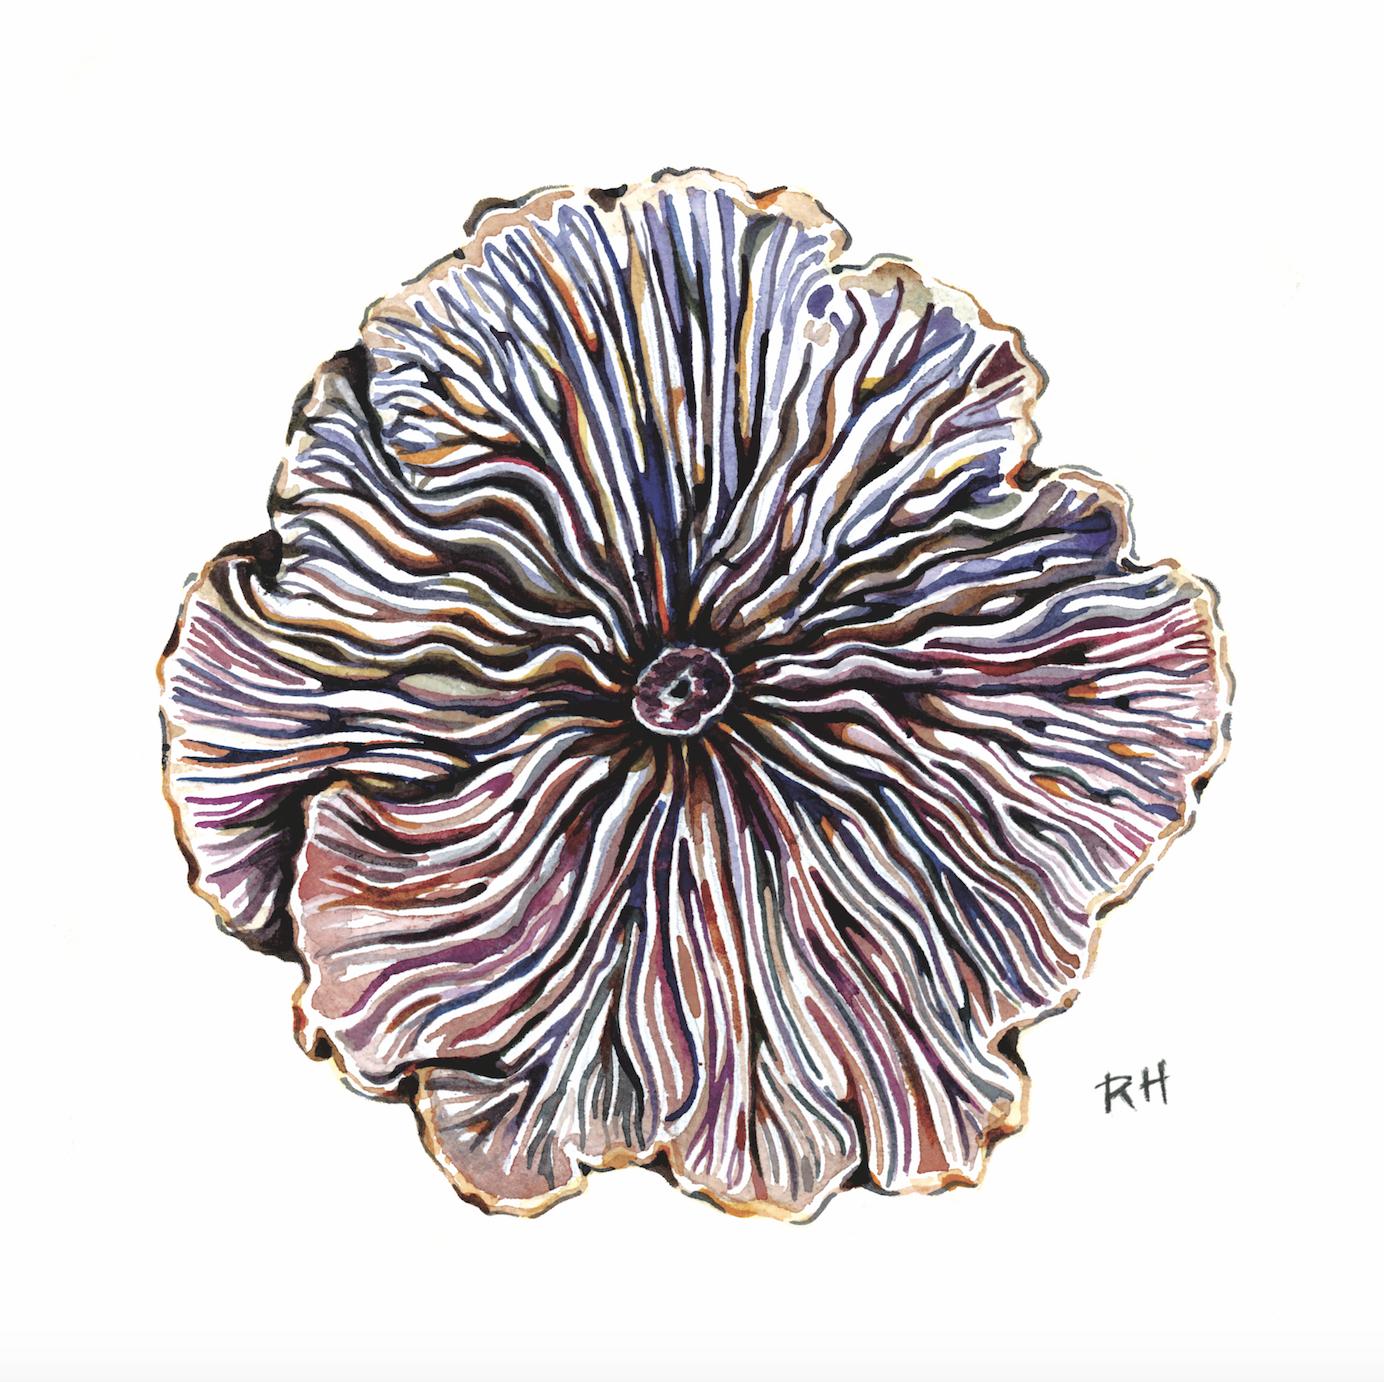 Mushroom gill painting